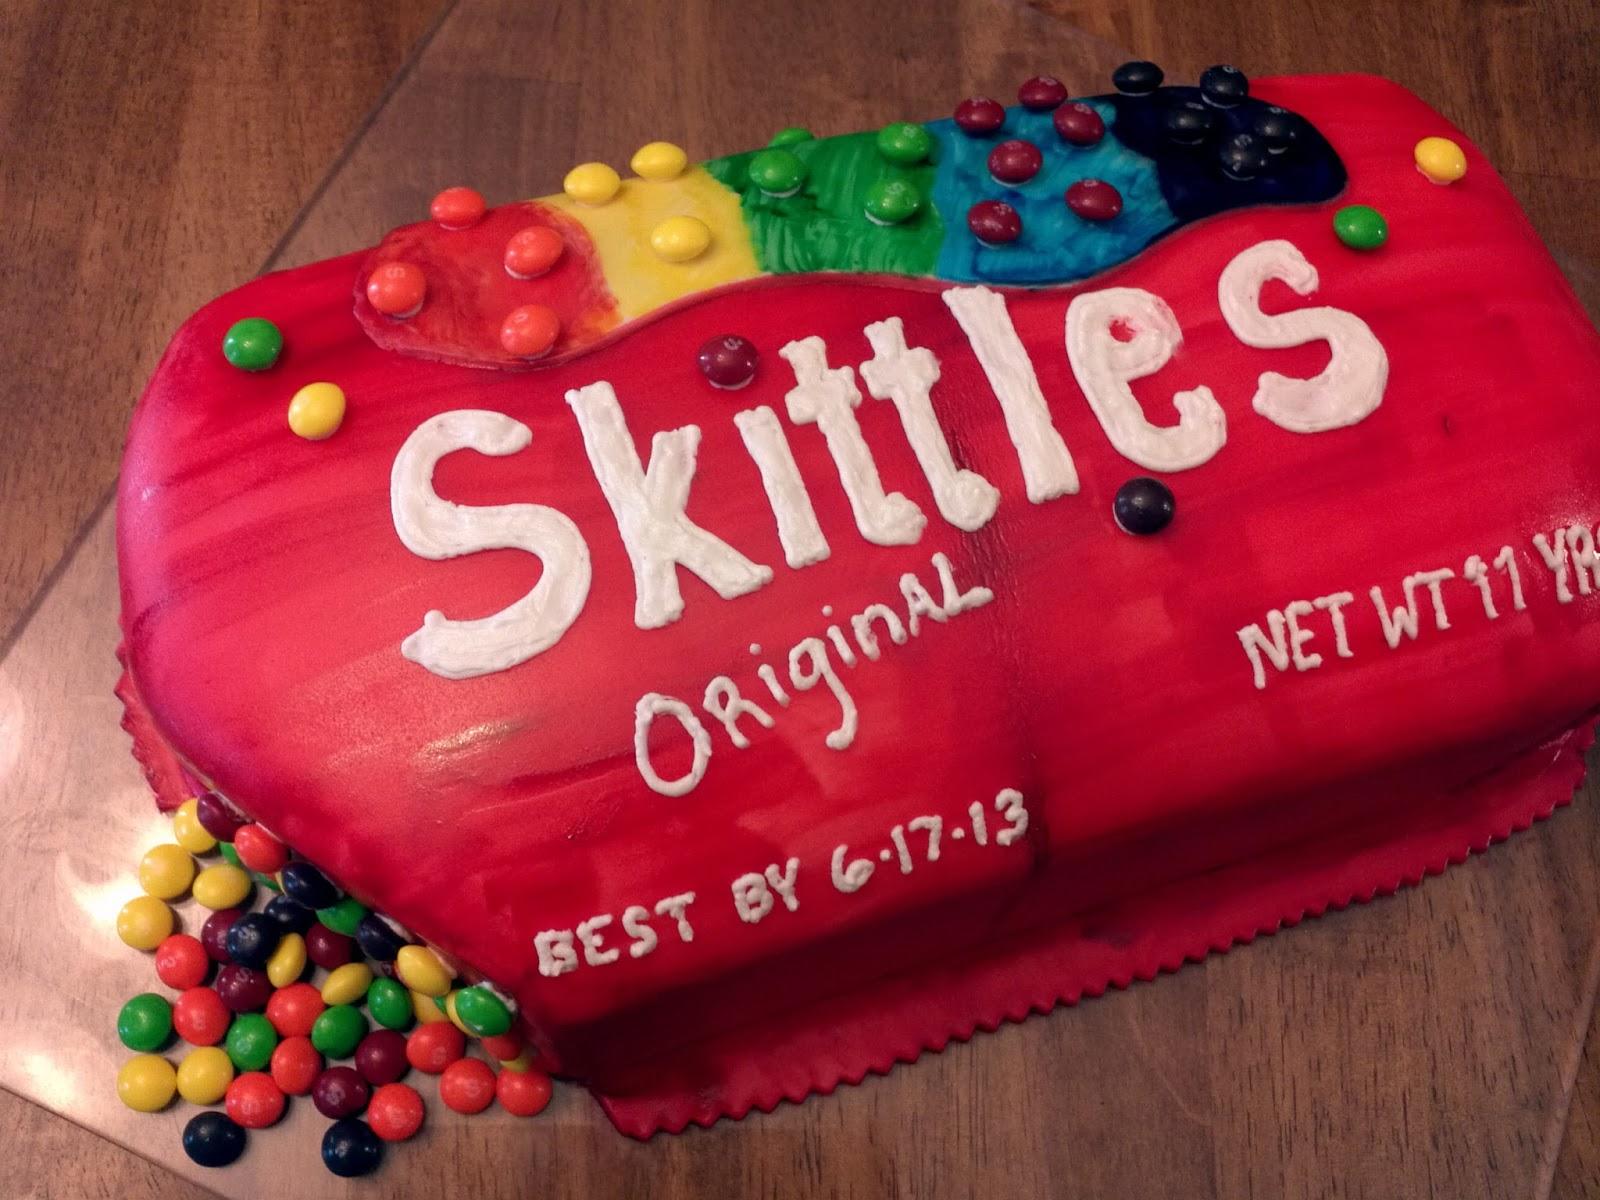 Skittles cake picture cake ideas and designs for Cake craft beavercreek ohio